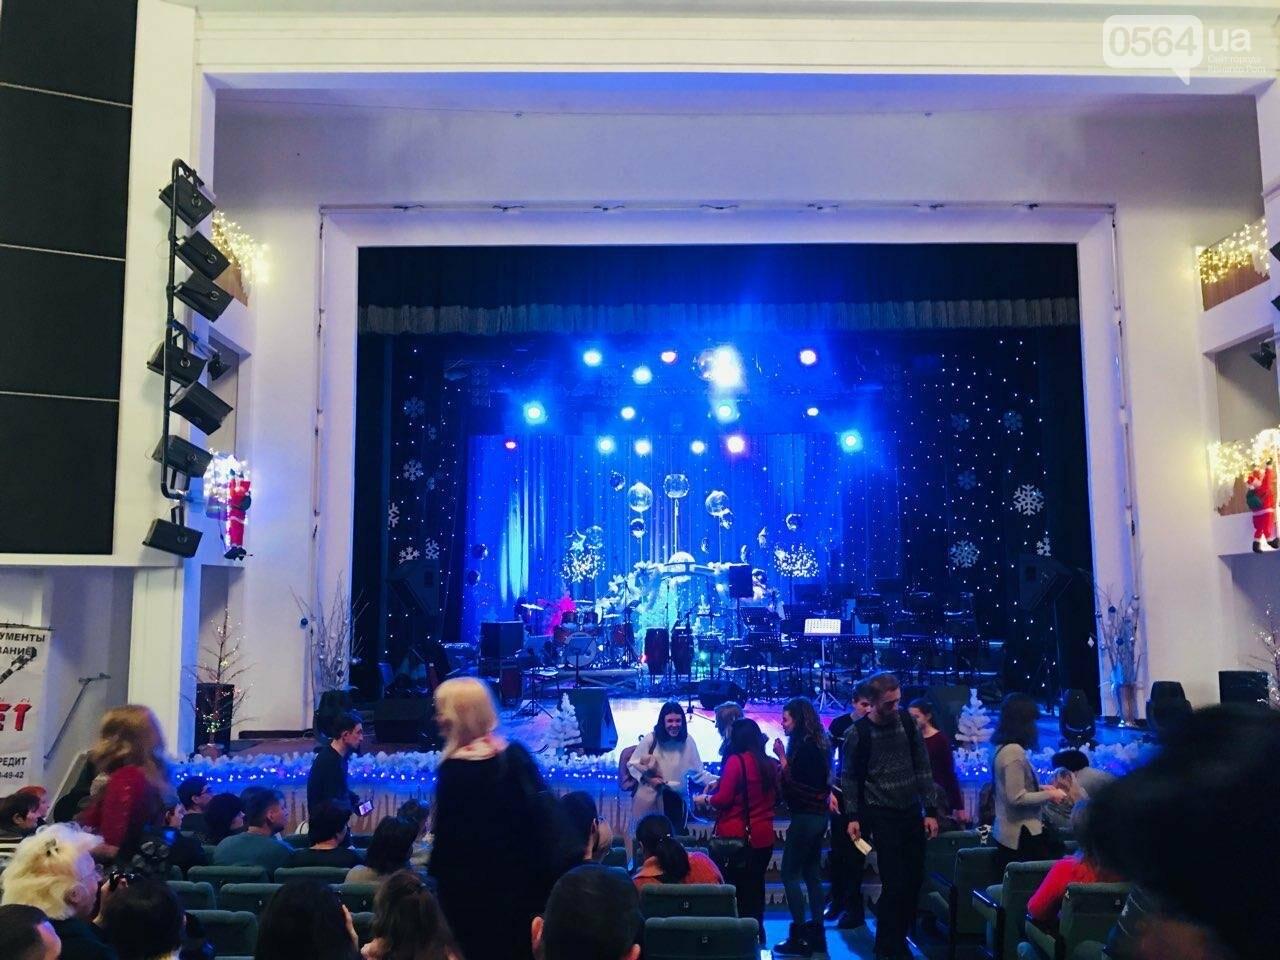 """Let it Snow"": на первое Рождество в Кривом Роге играют джаз, - ФОТО, ВИДЕО, фото-7"